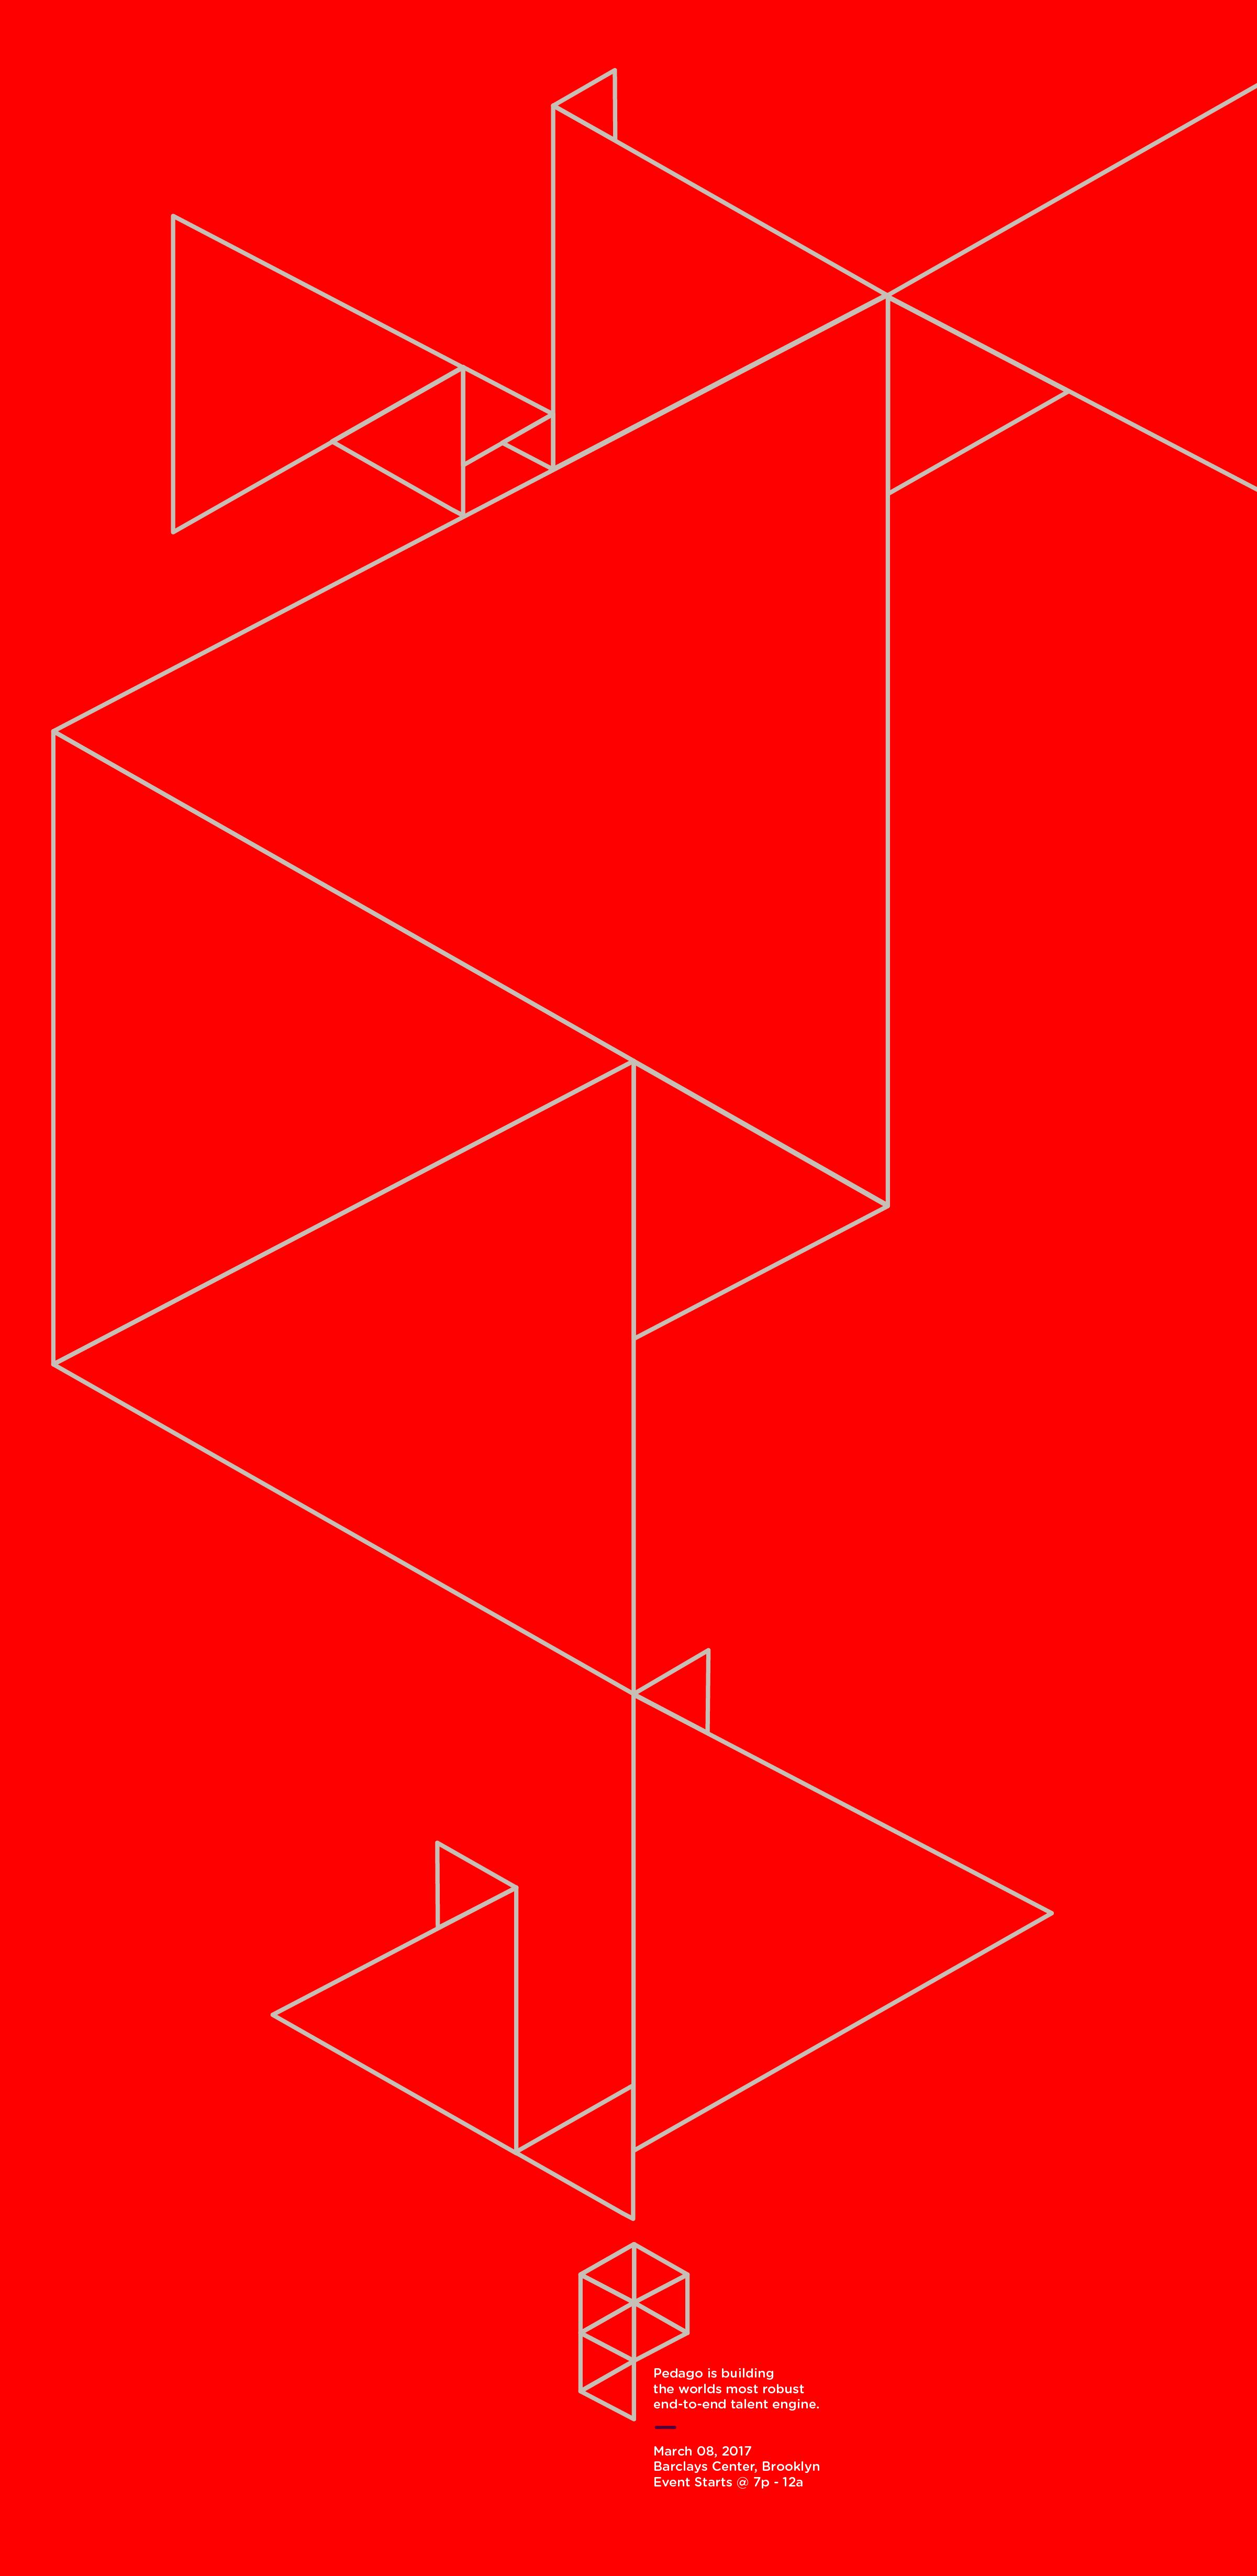 Pedago_BrandBook_Emblem-24